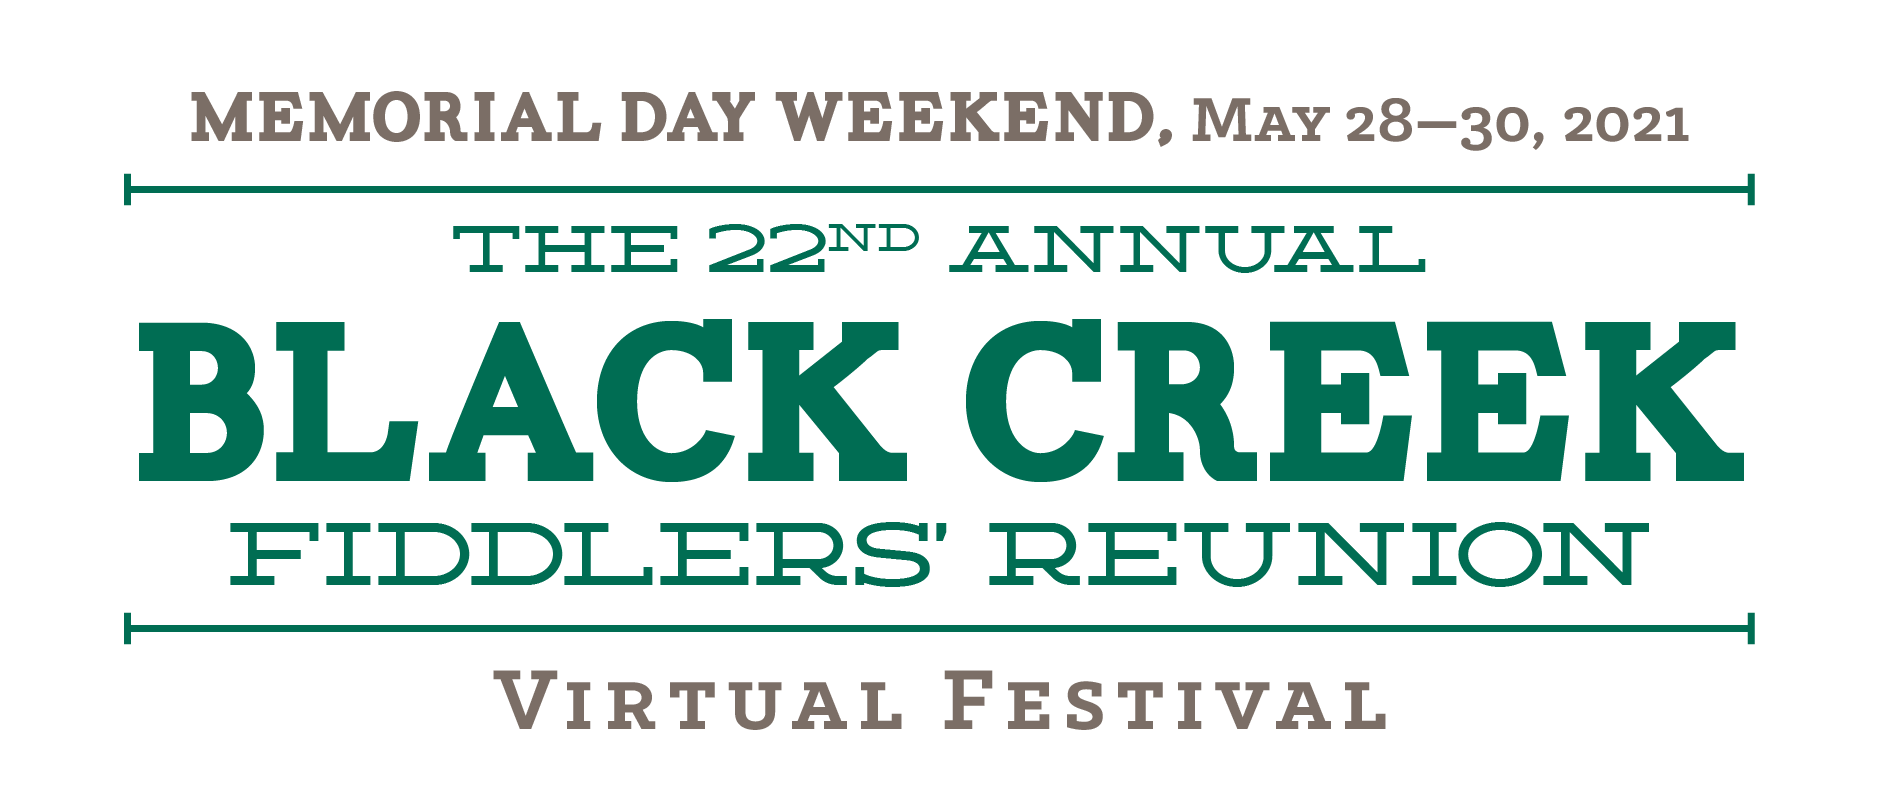 Black Creek Fiddlers' Reunion